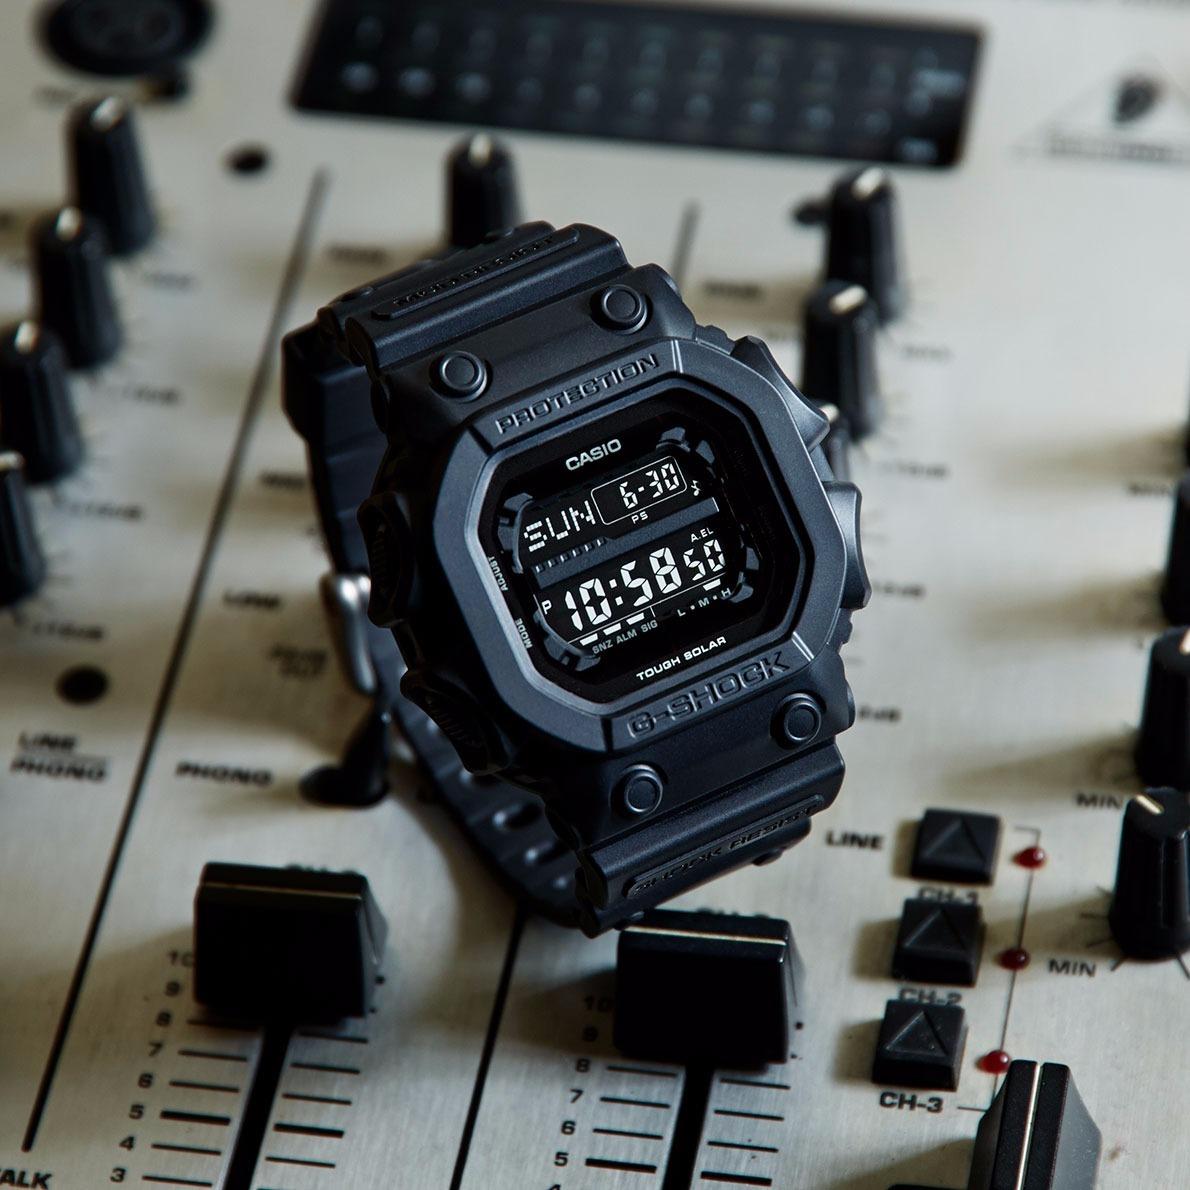 d78bfbe2d99 Relógio Original Casio G-shock Gx56 Energia Solar Gx-56bb - R  687 ...